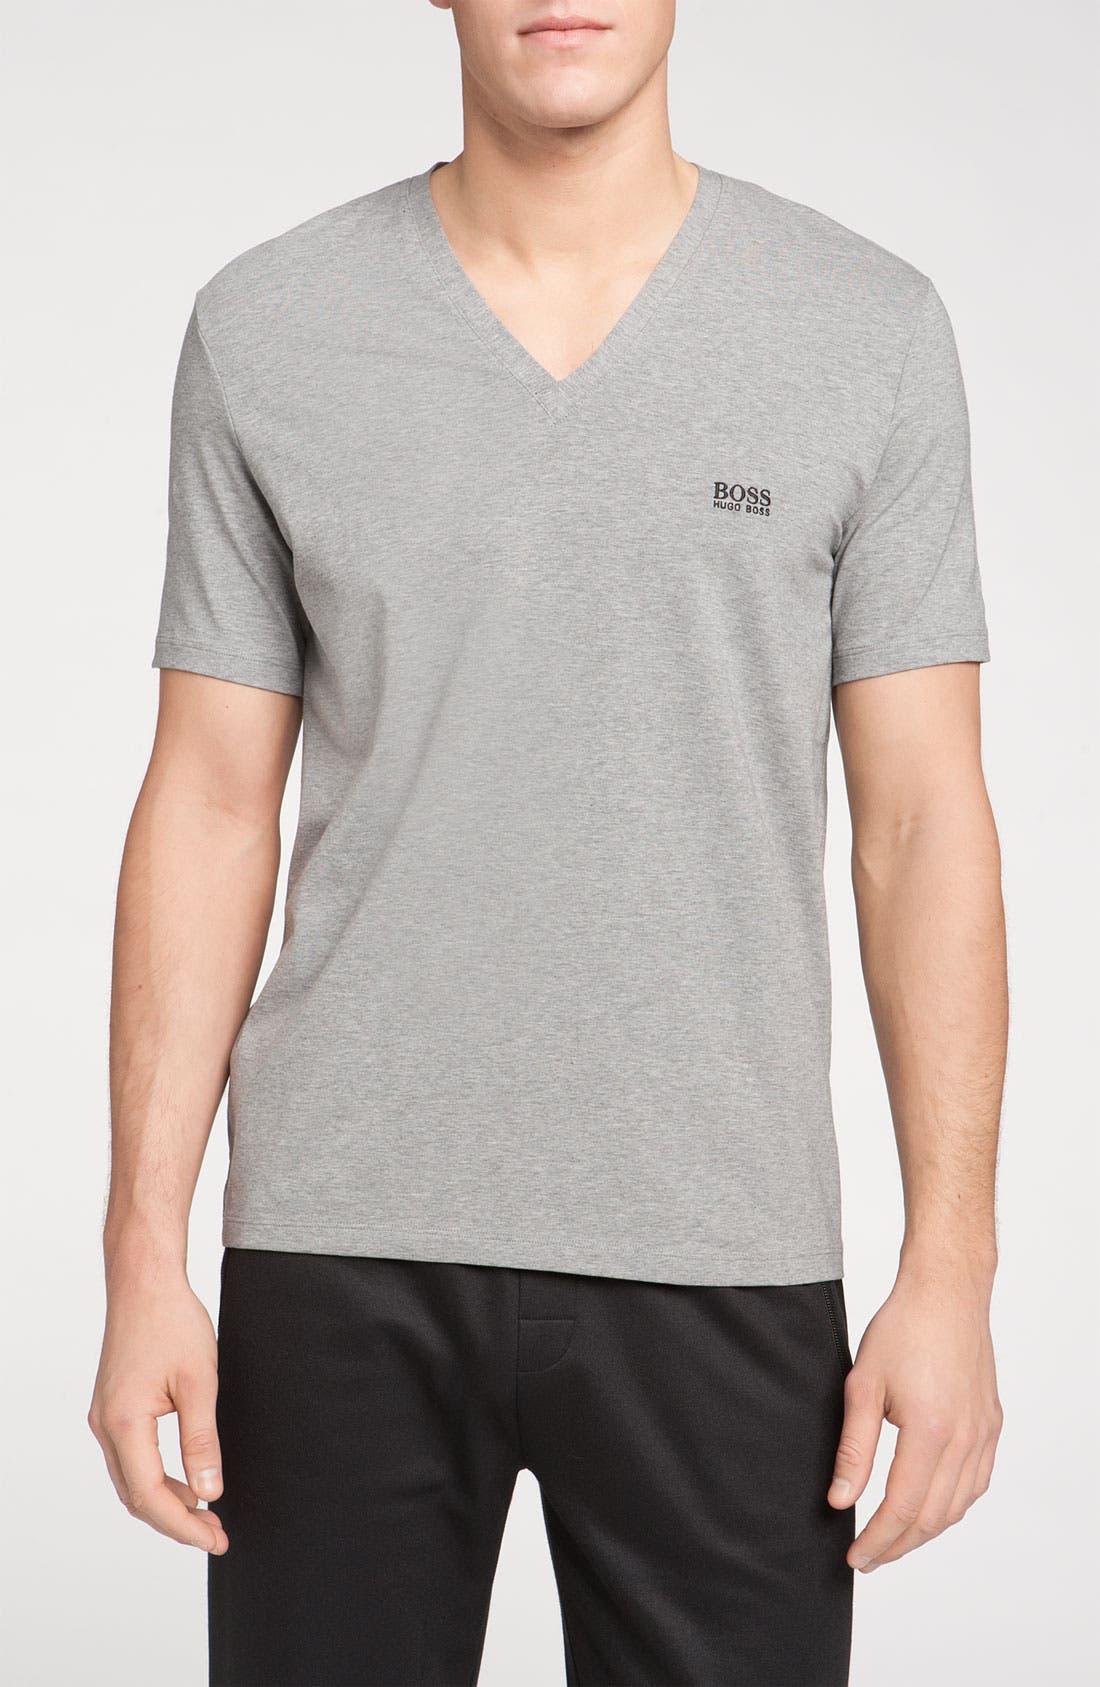 Main Image - BOSS Black 'Innovation 3' T-Shirt